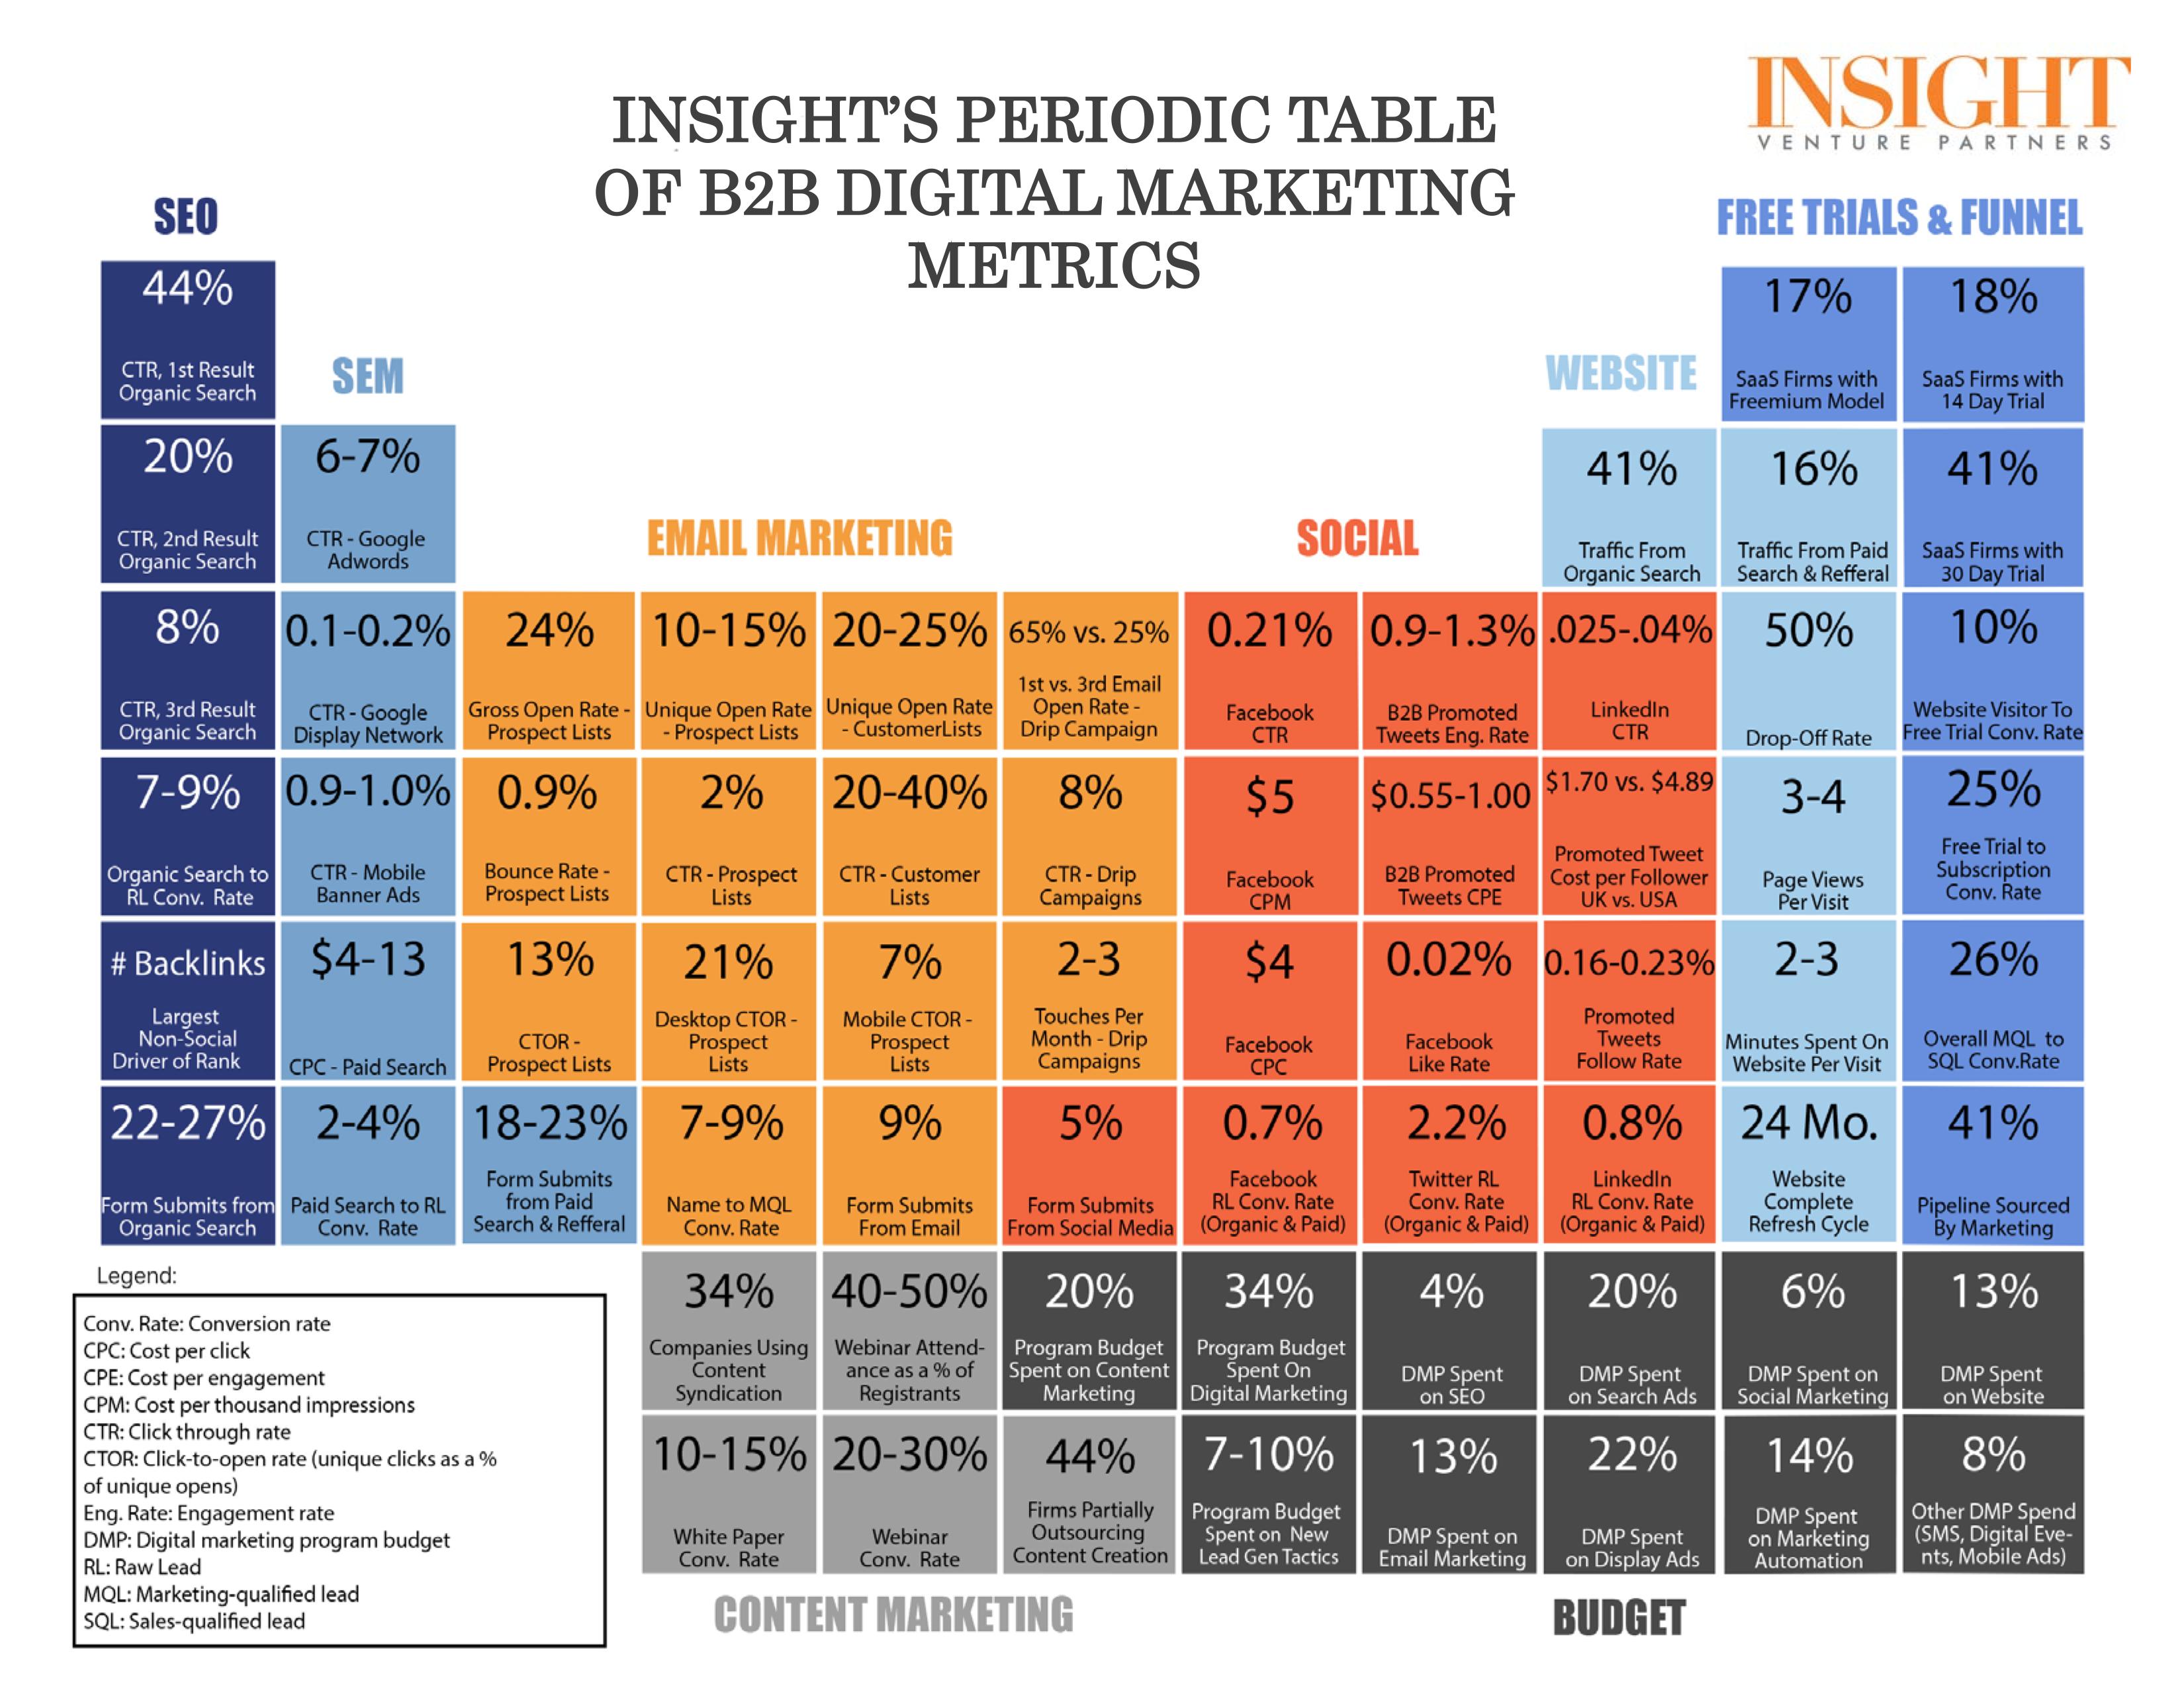 Tabla peridica de marketing digital socialnetworks pinterest tabla peridica de marketing digital urtaz Gallery